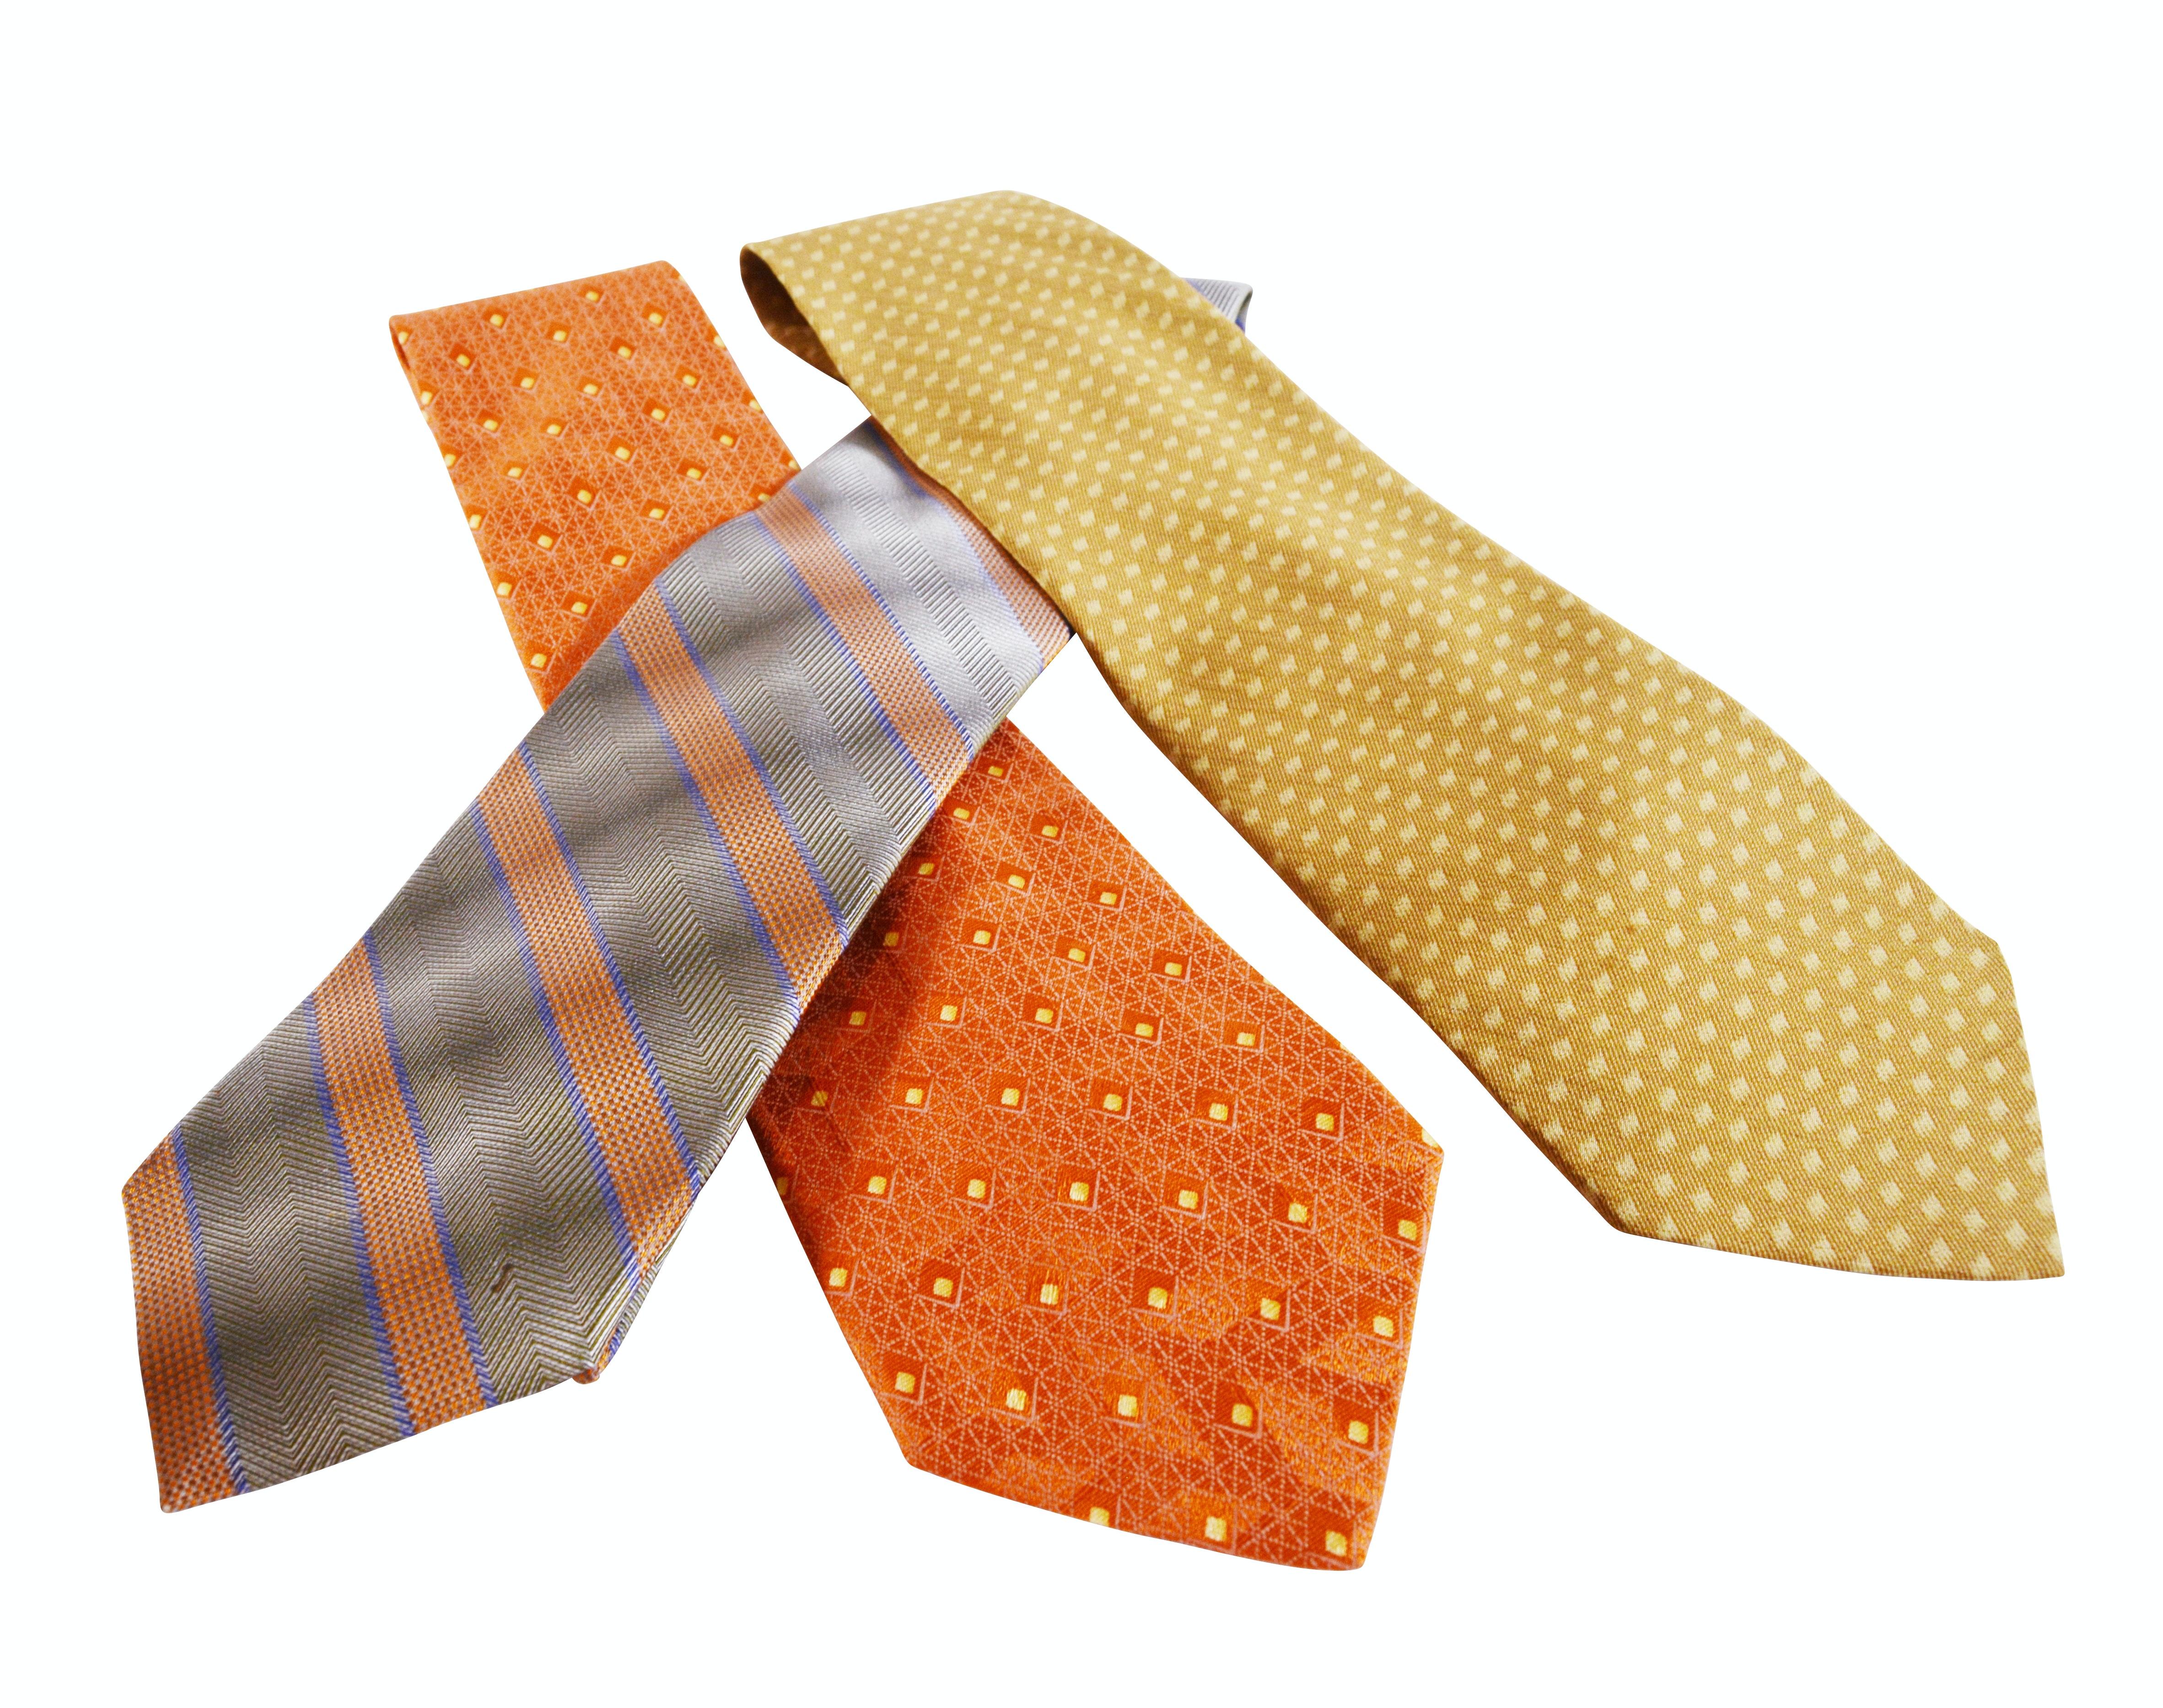 Giorgio Armani Cravatte, Robert Talbott, Ermenegildo Zegna Silk Neckties